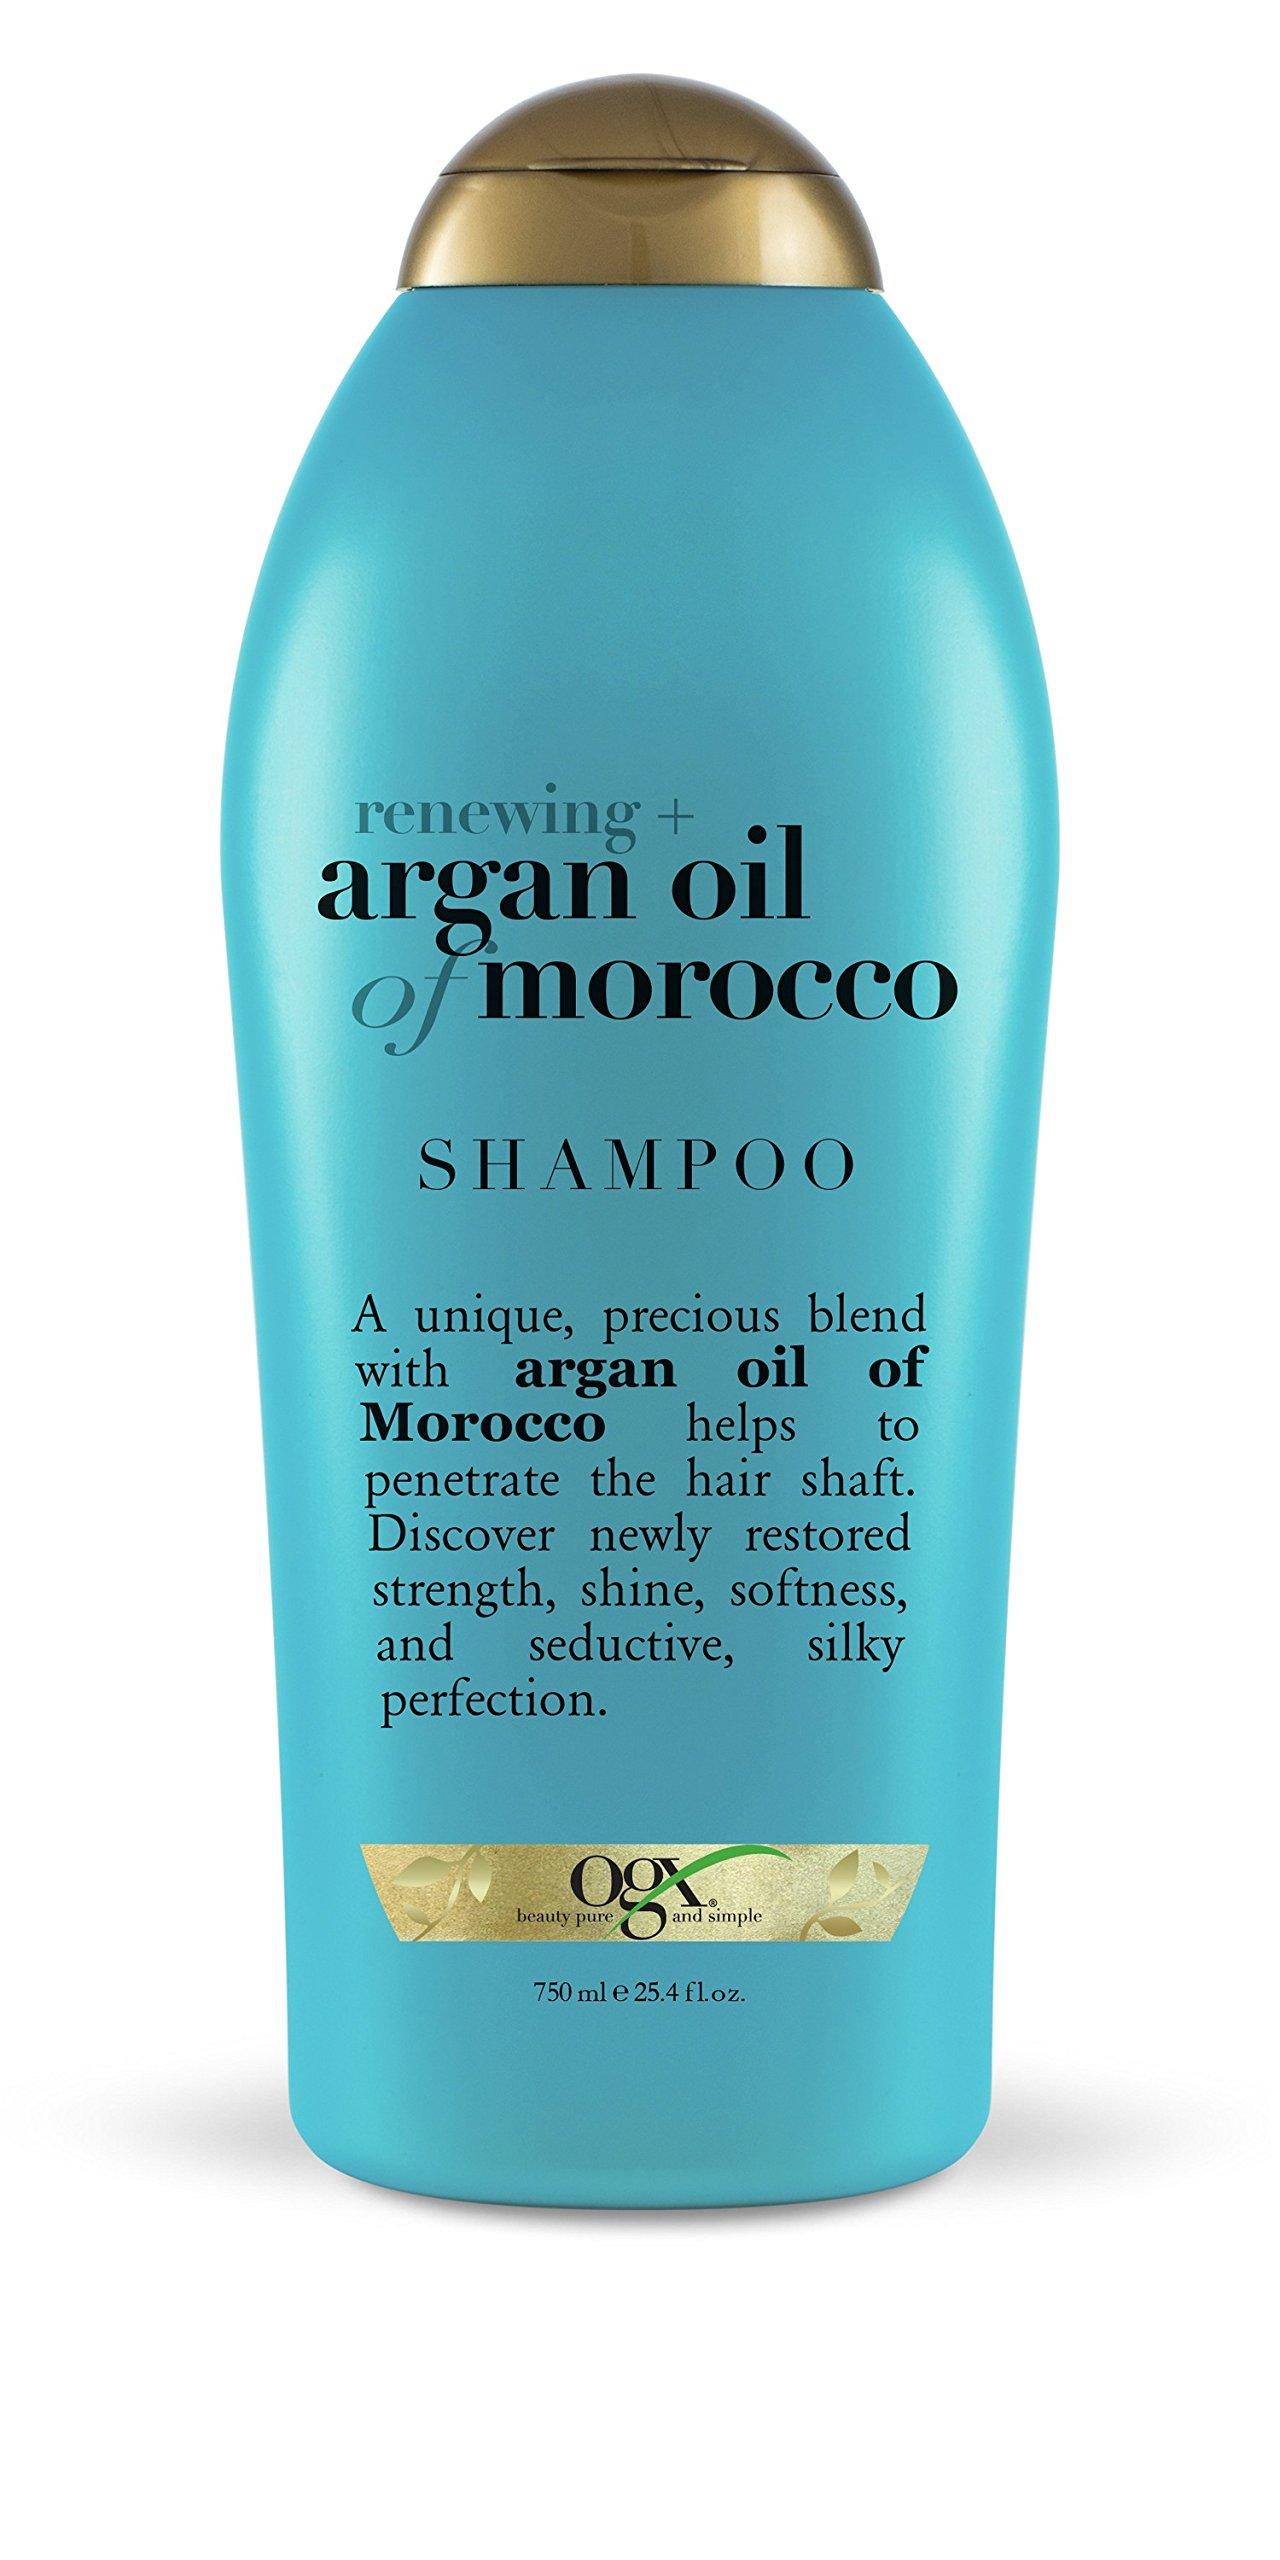 ogx renewing argan oil of morocco conditioner. Black Bedroom Furniture Sets. Home Design Ideas